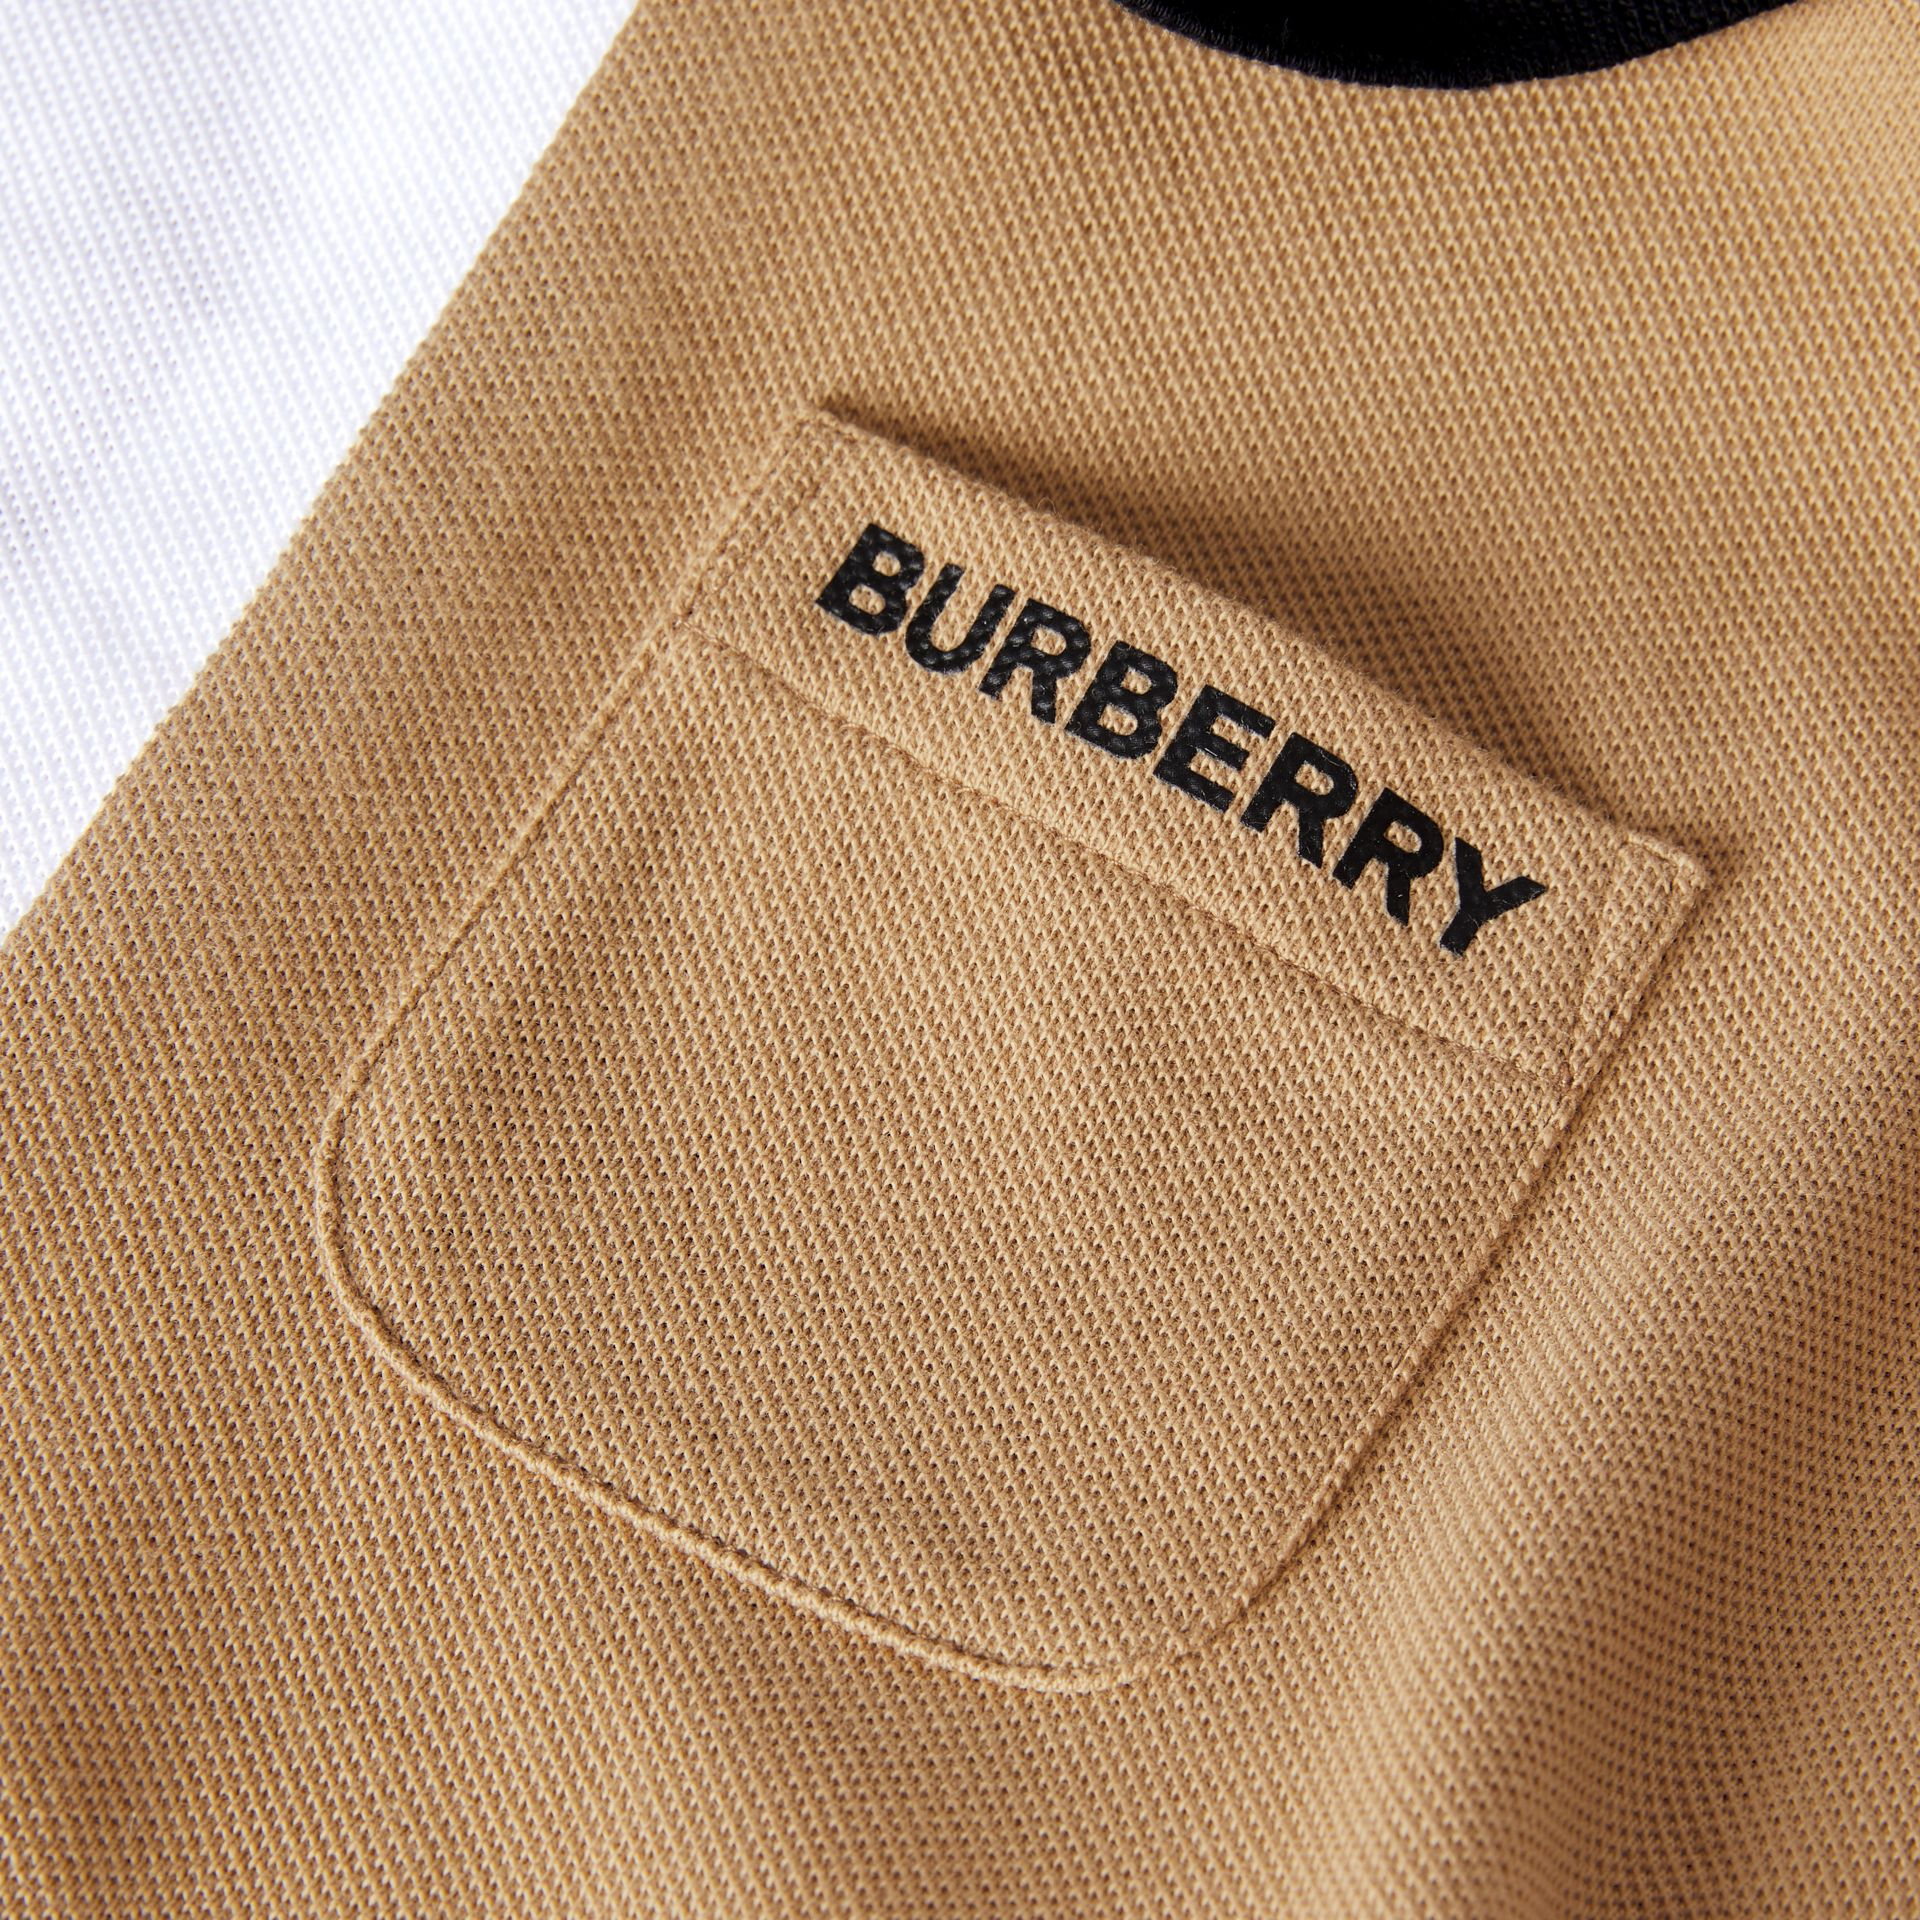 Colour Block Knit Cotton Polo Shirt Dress in Multicolour - Children | Burberry United Kingdom - gallery image 1